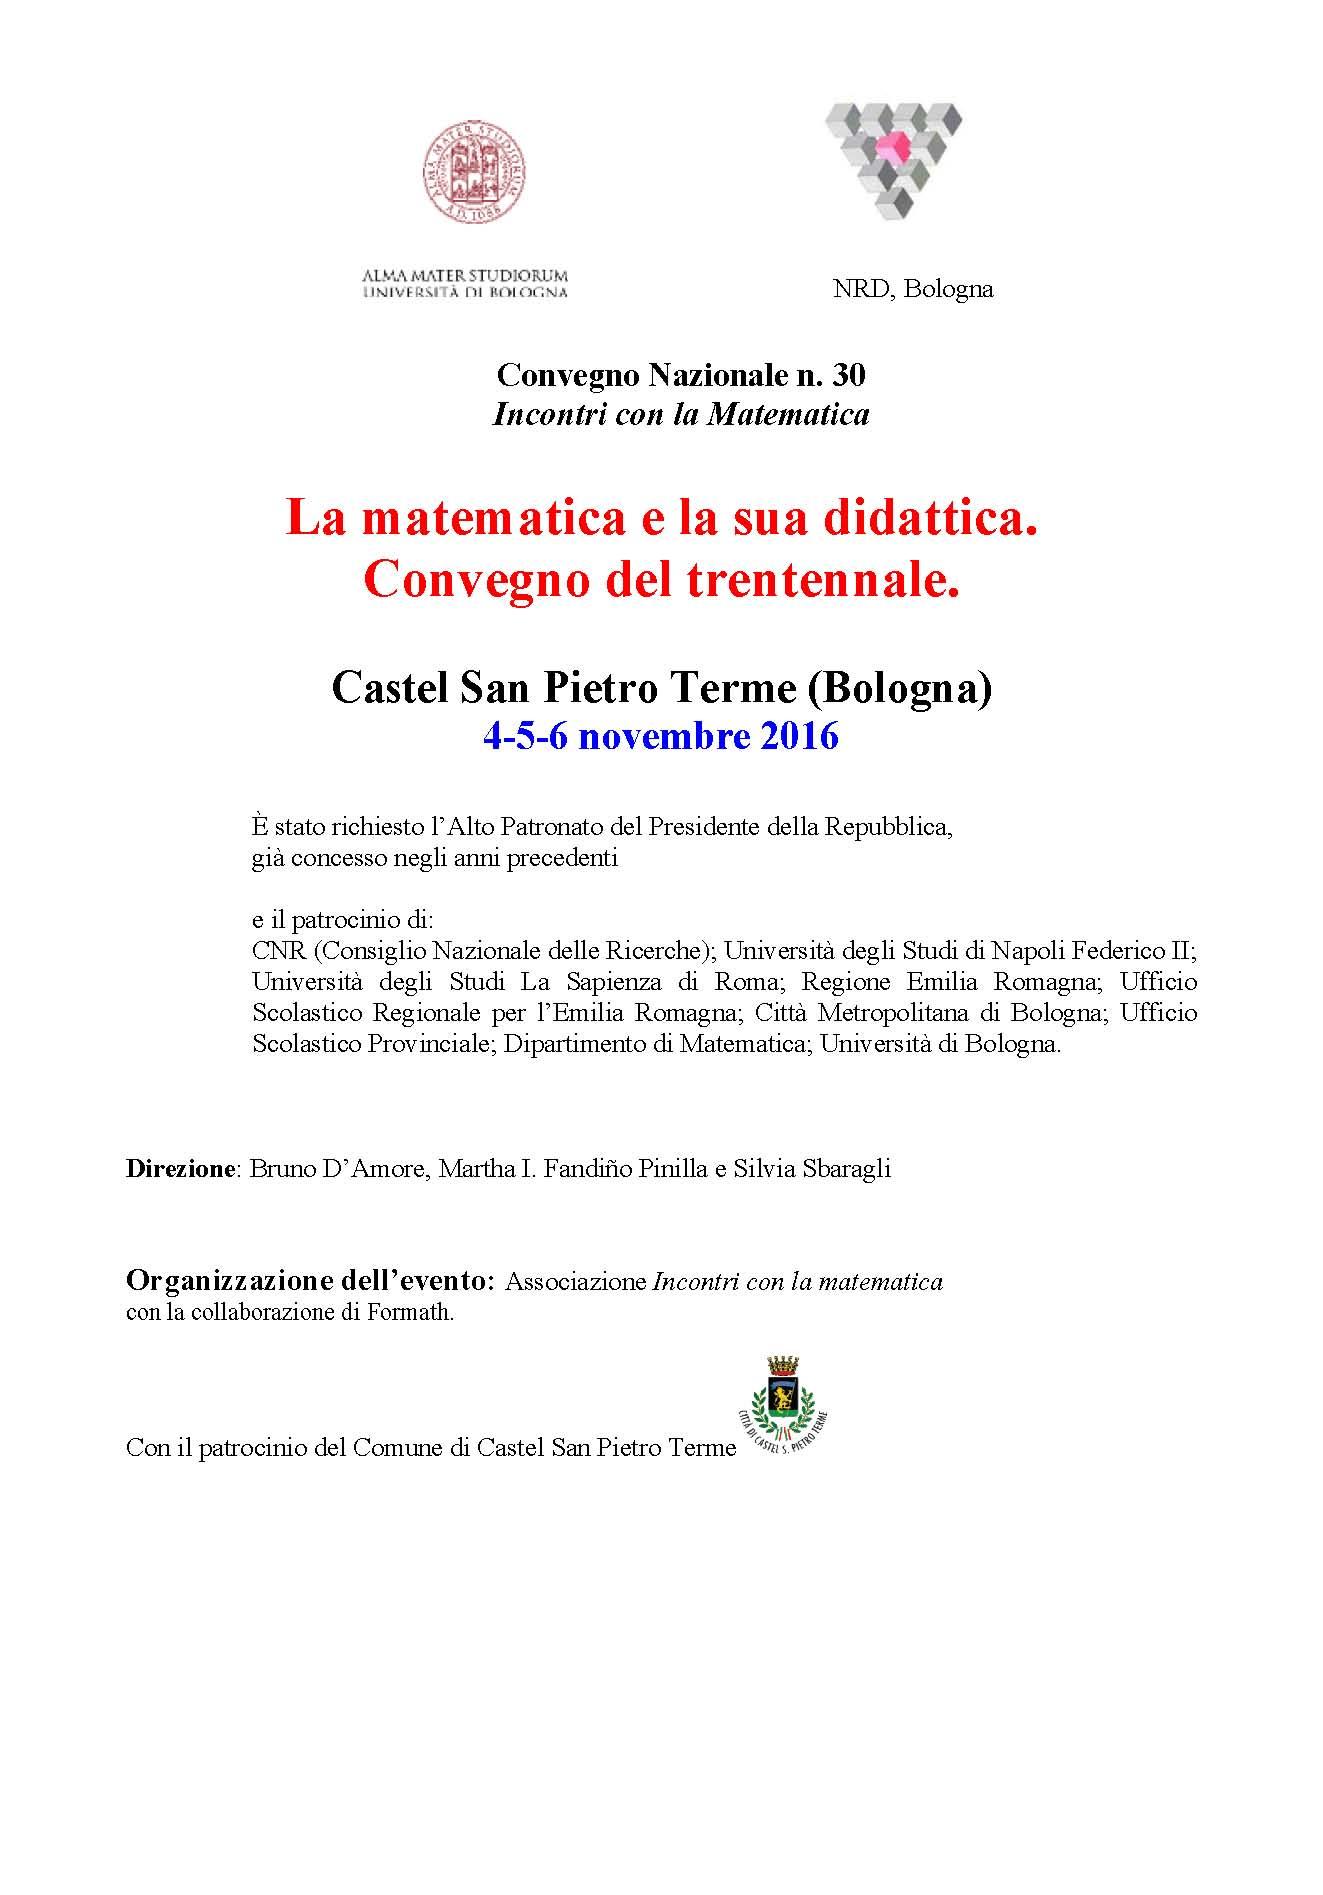 Geometriko Convegno Castel San Pietro Terme